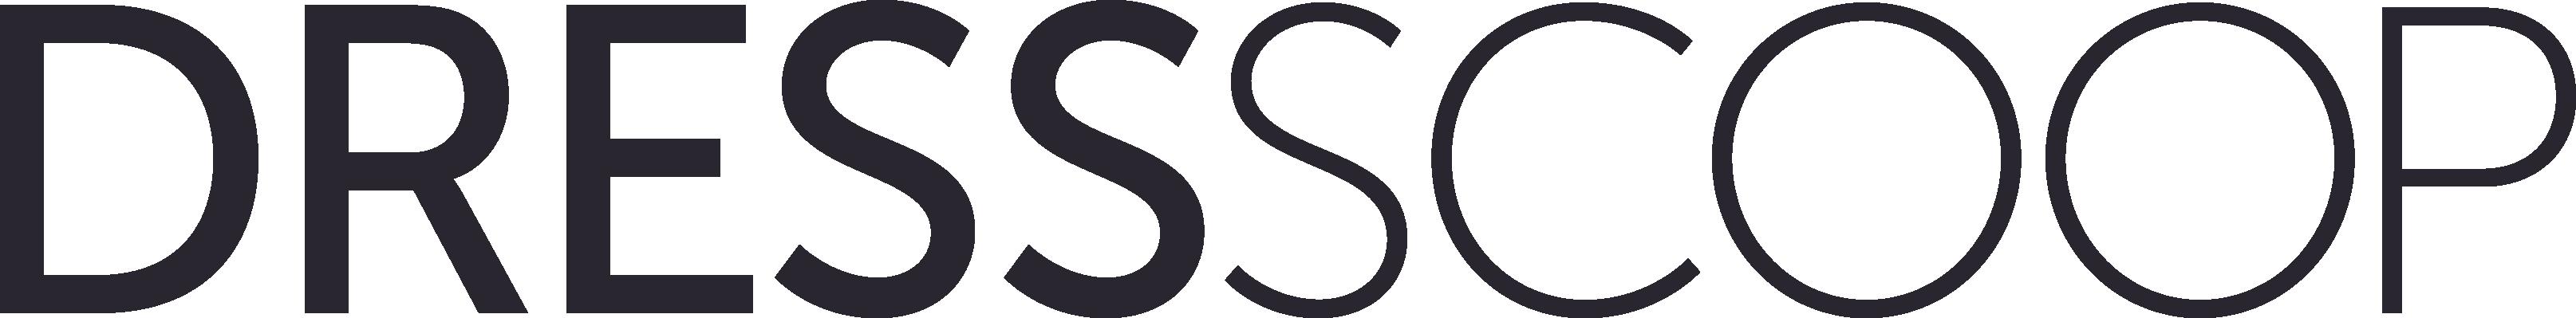 https://www.prositeweb.ca/wp-content/uploads/2020/11/DressScoop_Source.png